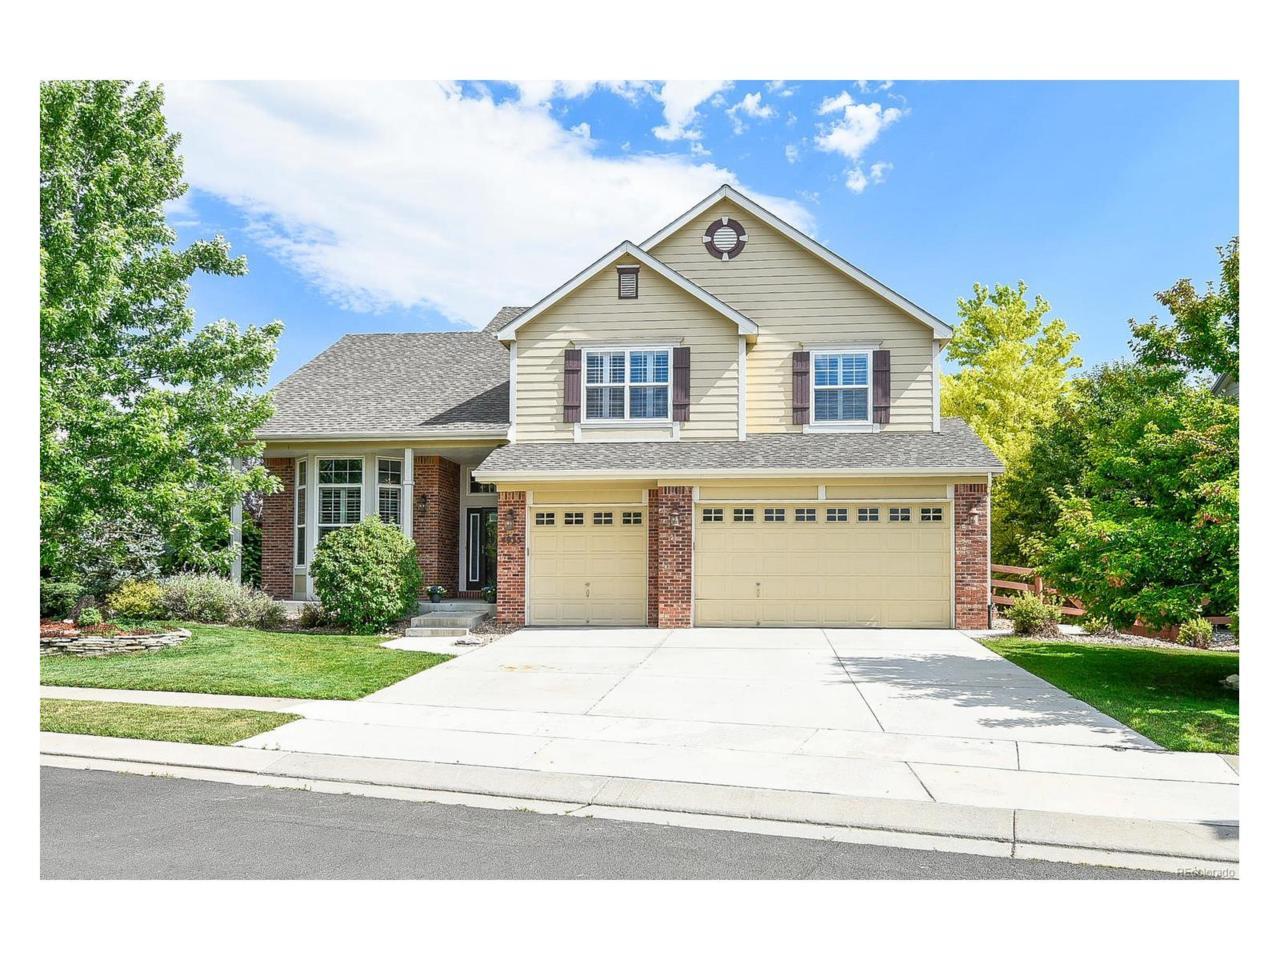 4935 Blue Heron Court, Broomfield, CO 80023 (MLS #5884137) :: 8z Real Estate